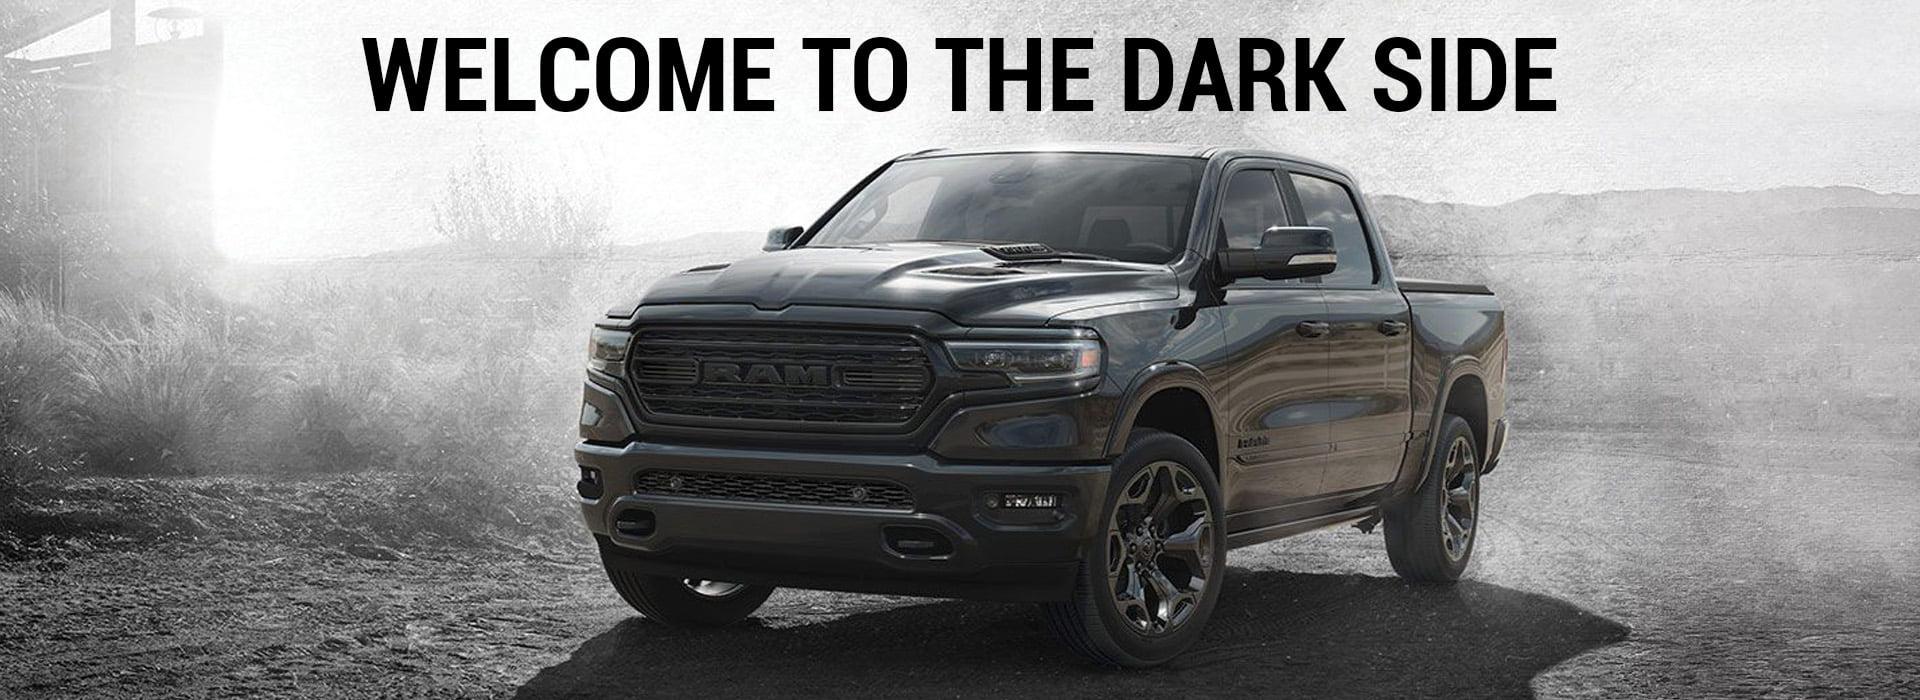 2020 ram black appearance